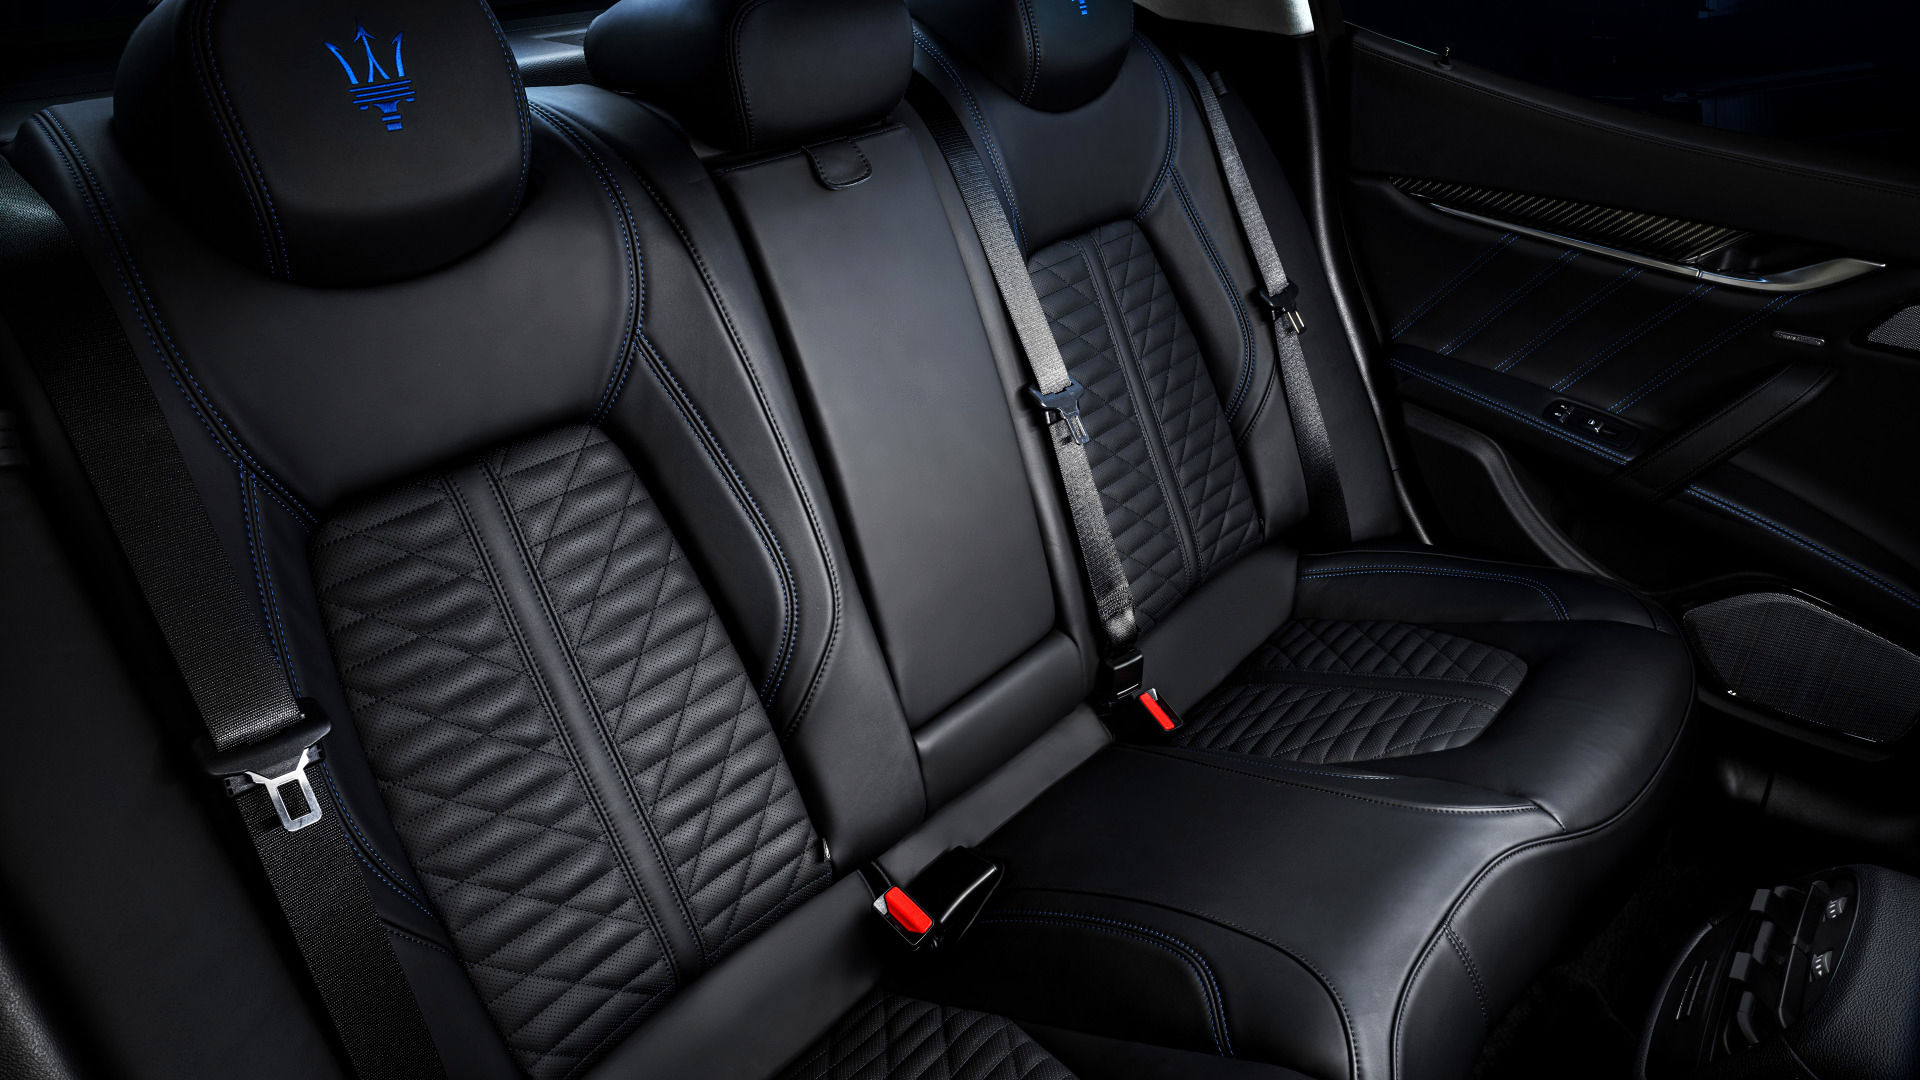 Maserati Ghibli - Interieur - Grau - Nahansicht der Rücksitzbank